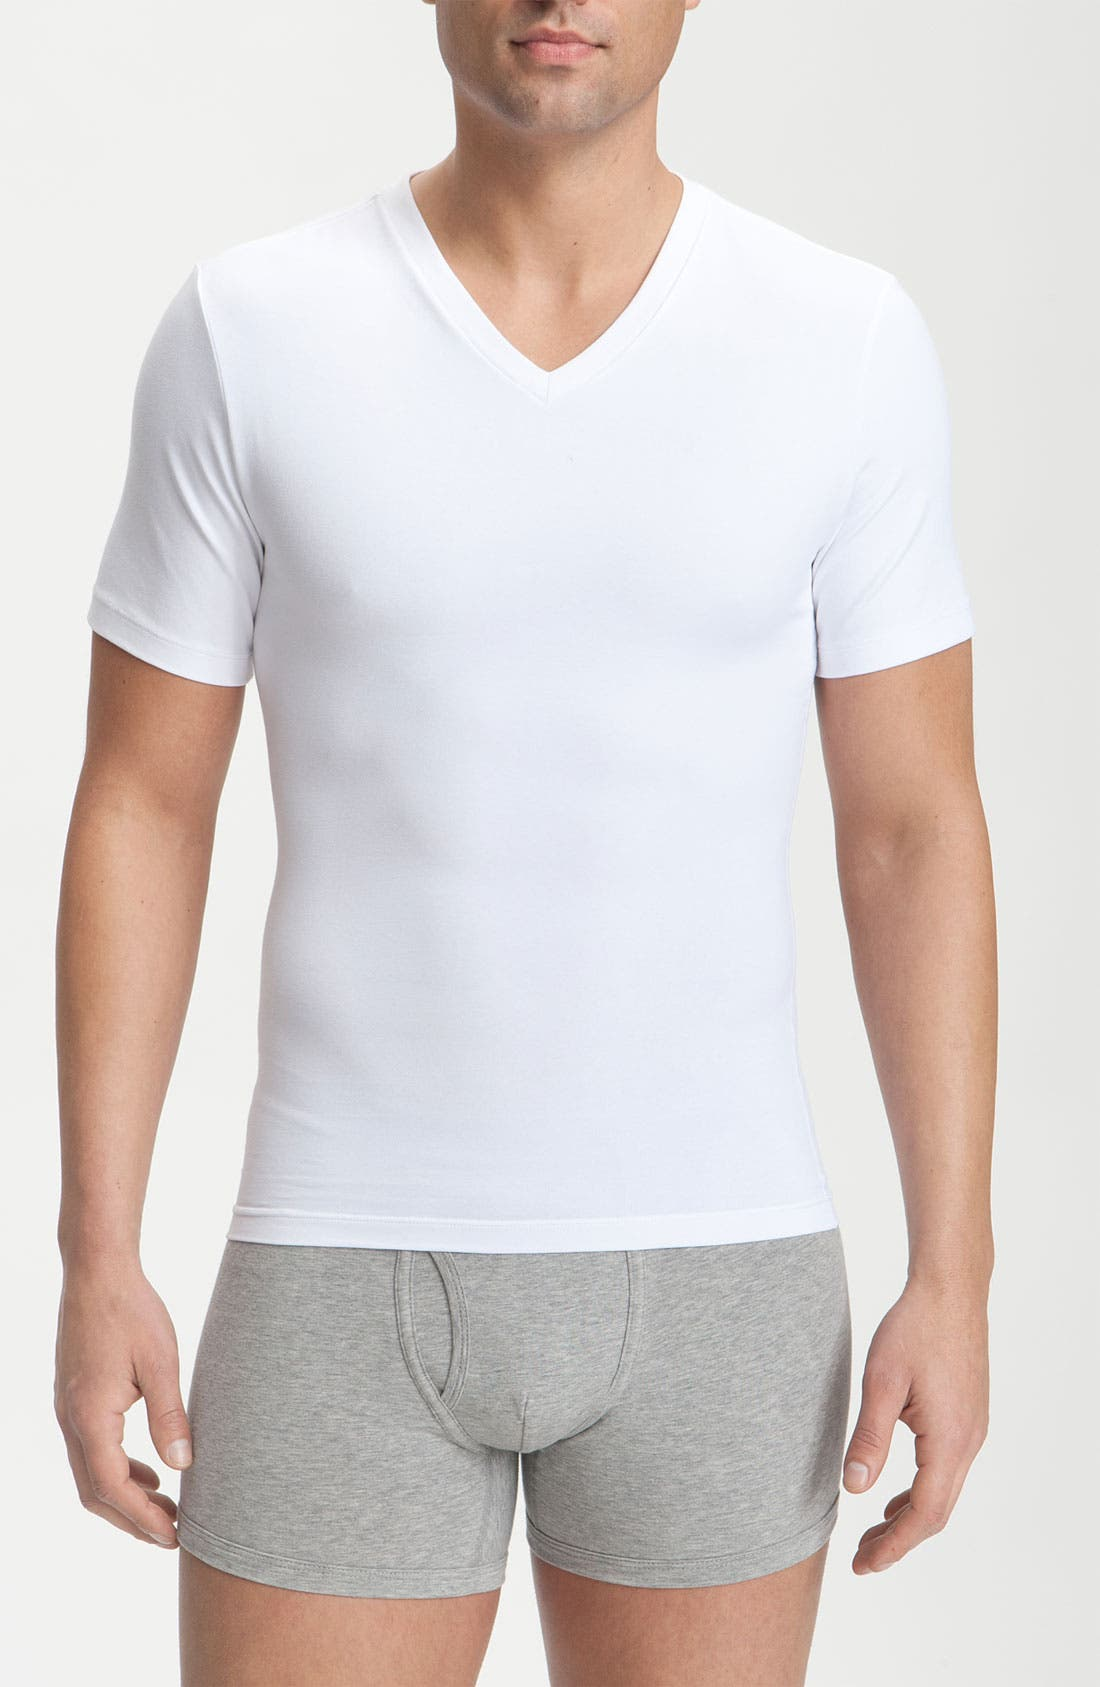 Alternate Image 1 Selected - SPANX® Cotton Control V-Neck T-Shirt